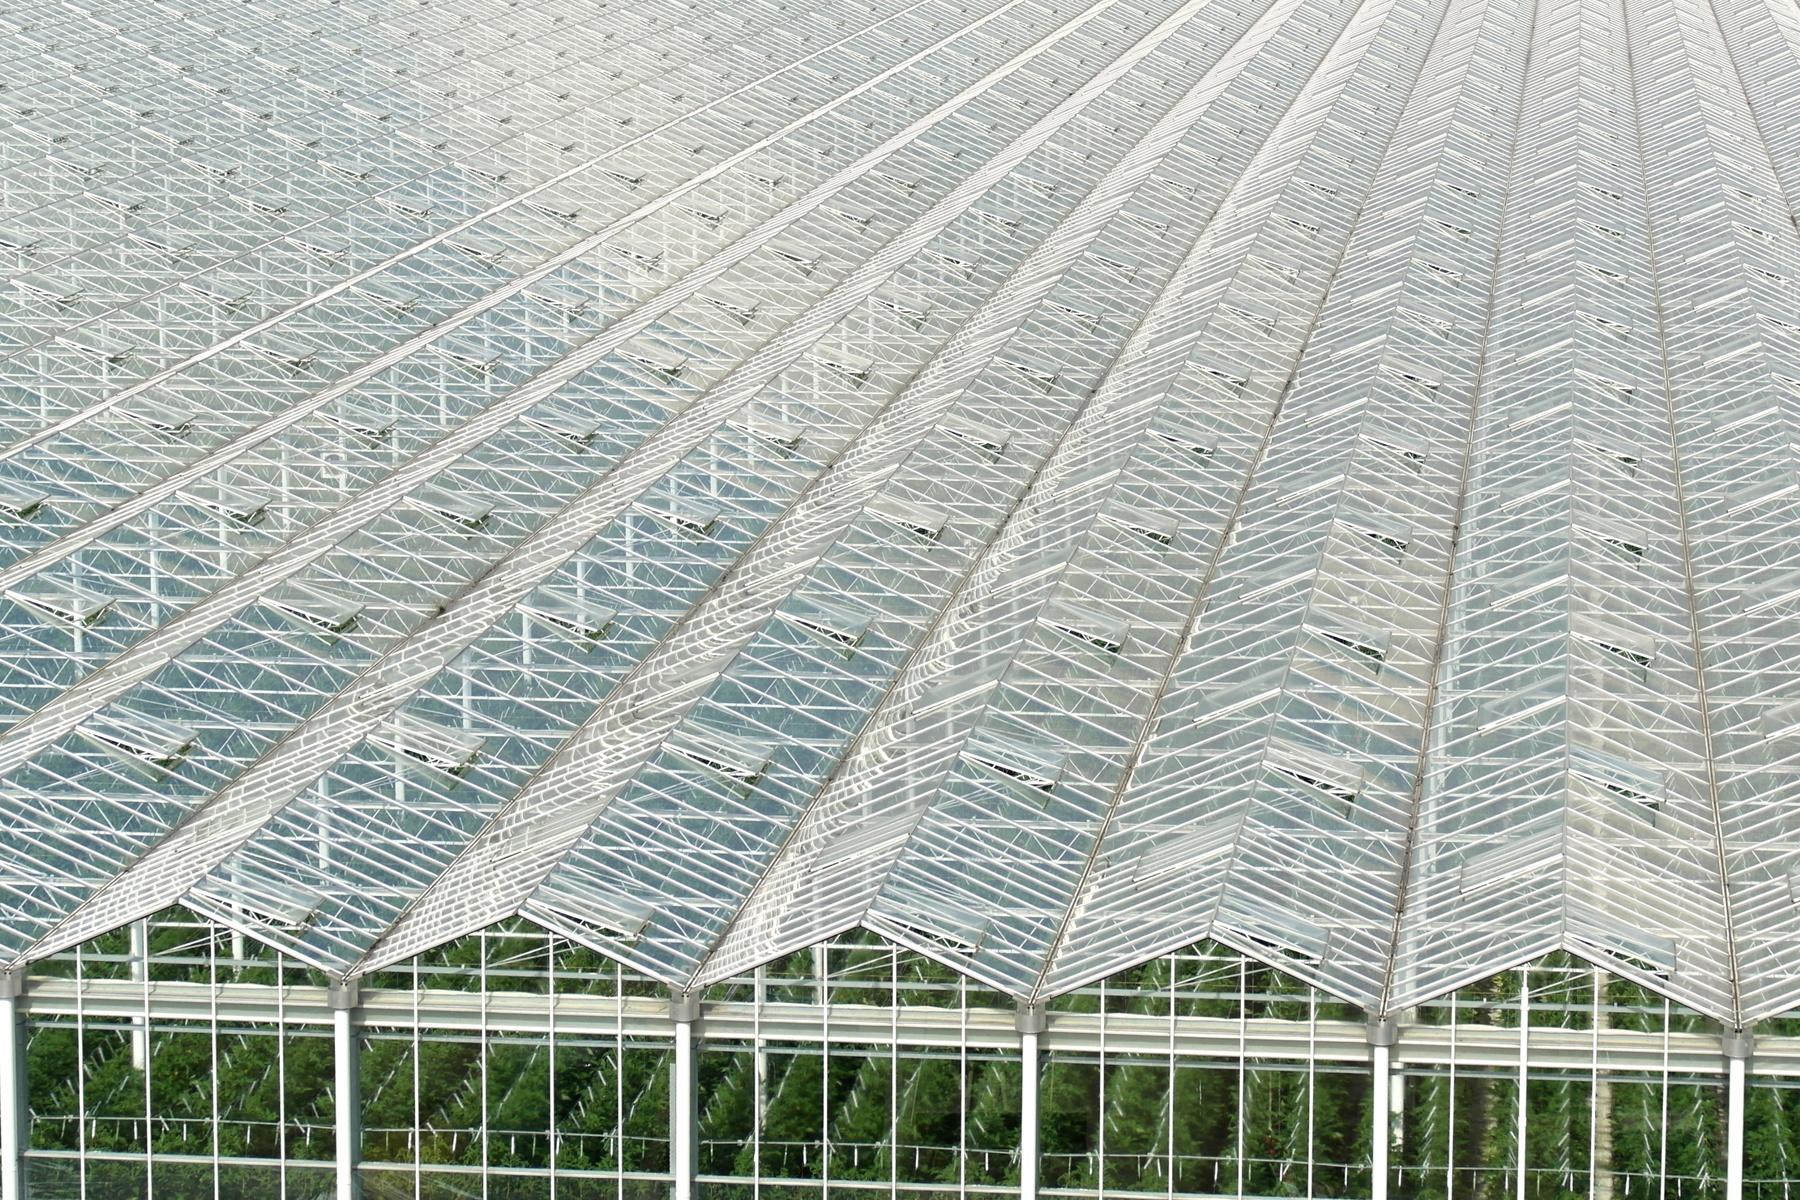 Greenhouse - 11OCT13.jpg